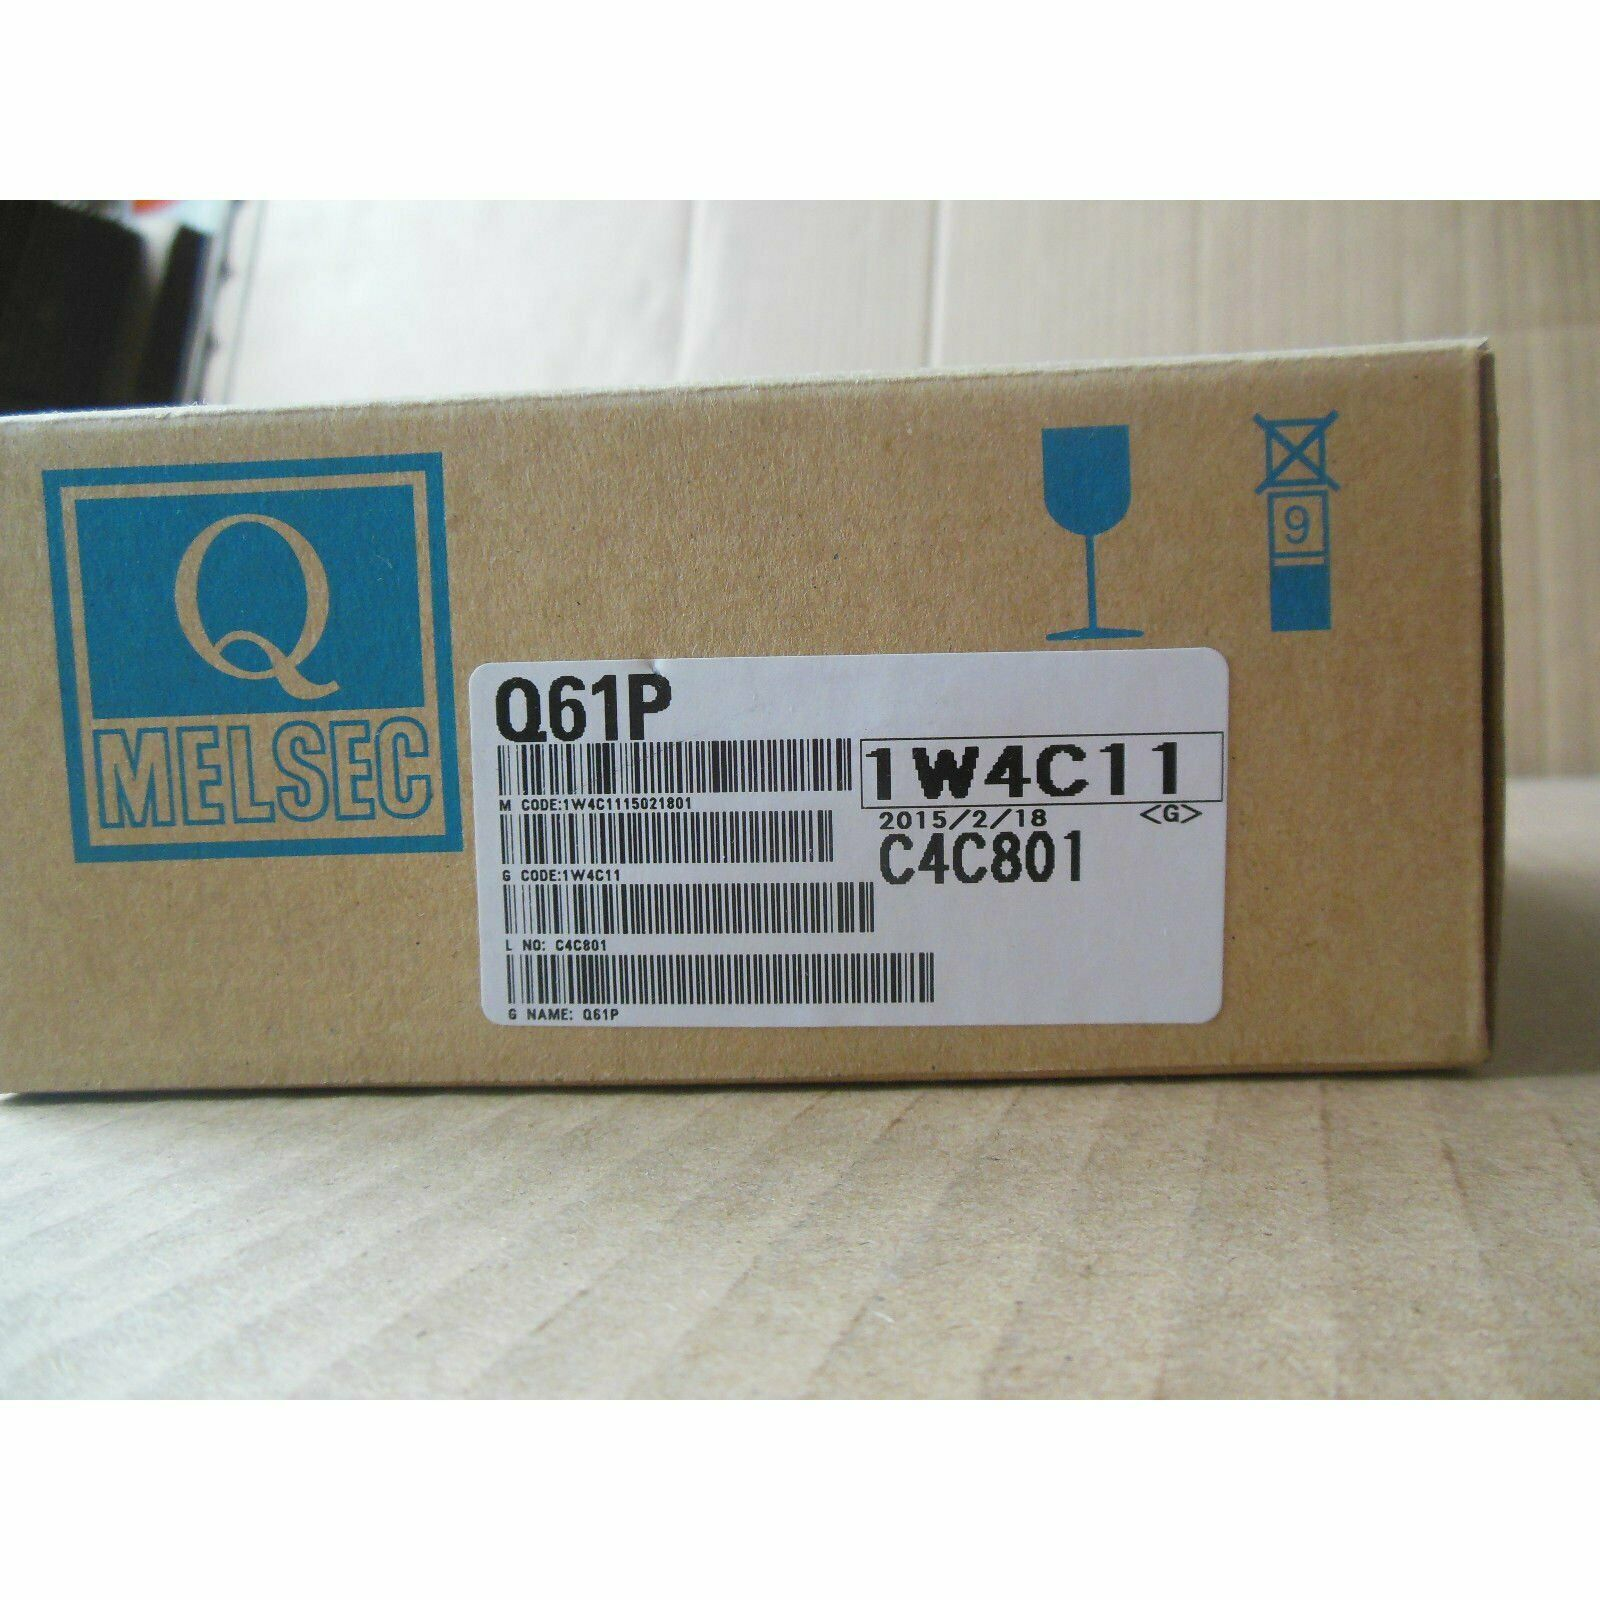 1PC NEW Q61P Mitsubishi Power Supply Module FREE SHIPPING